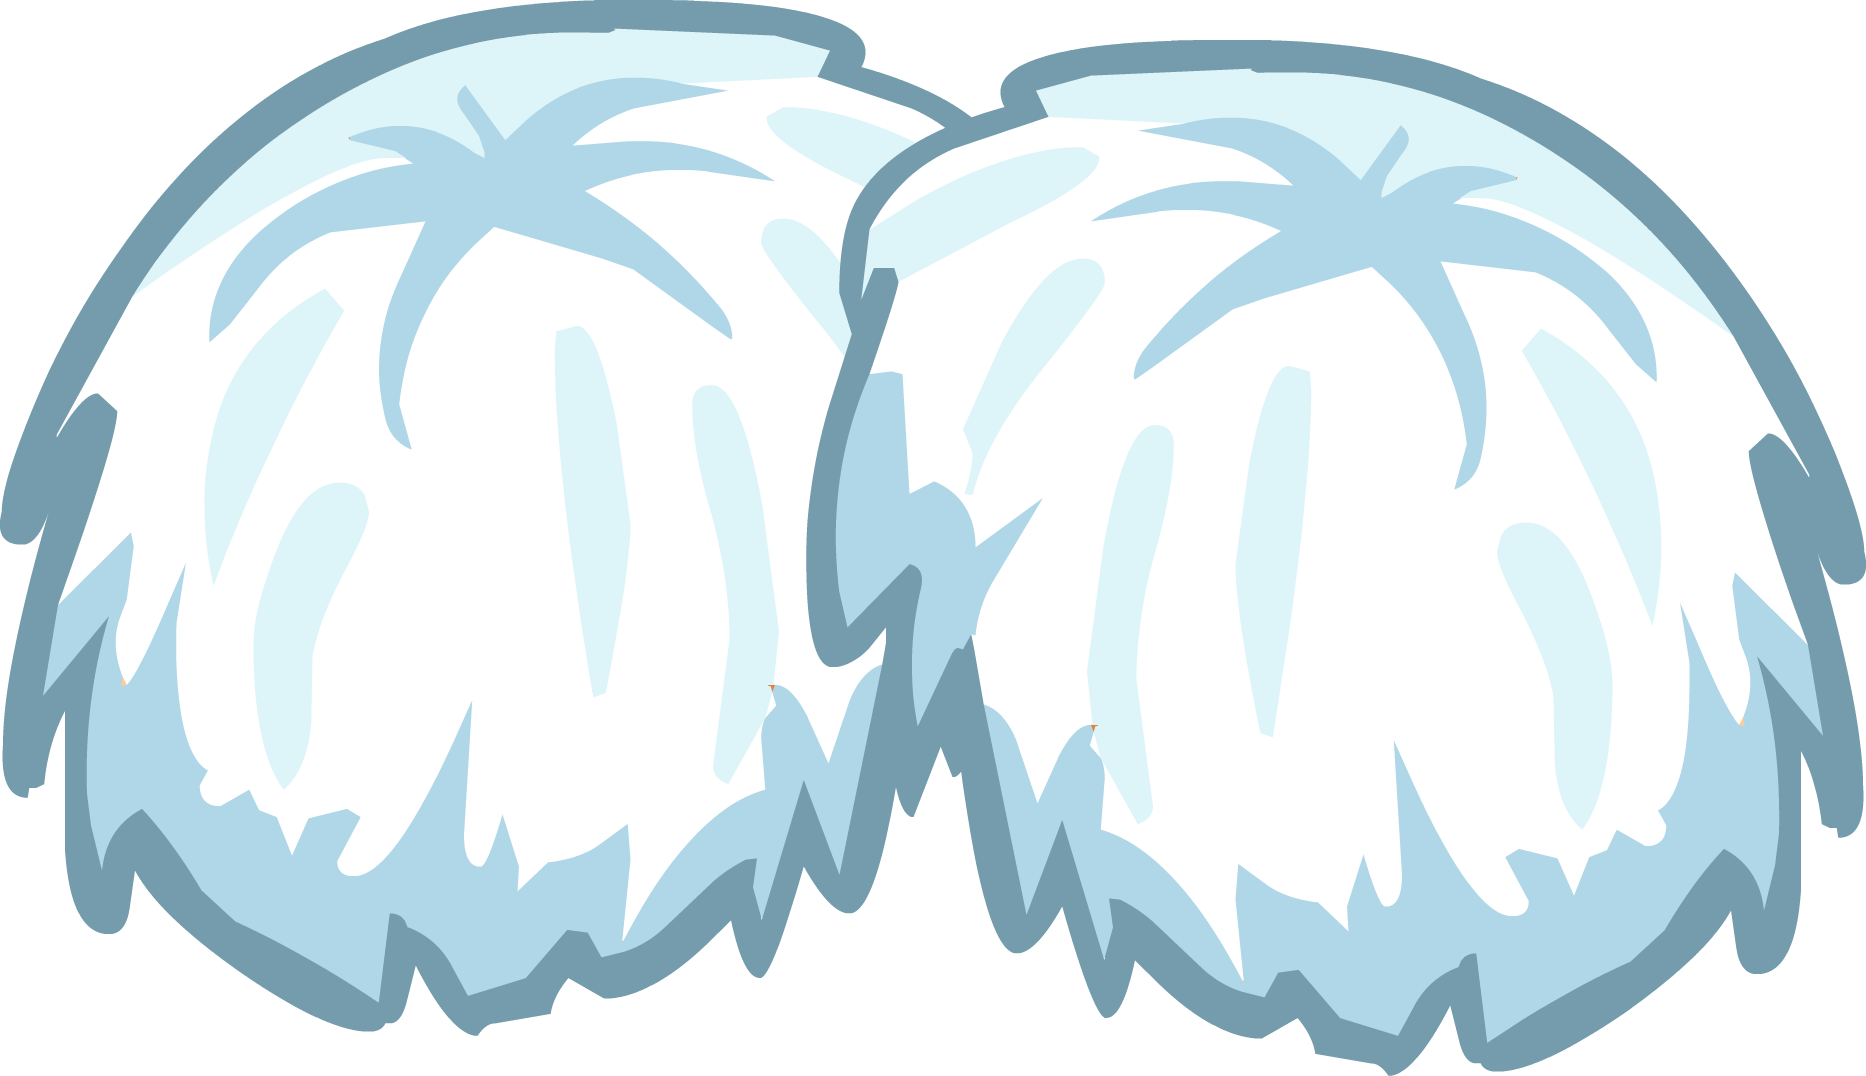 White clipart pom pom. Pompoms club penguin wiki